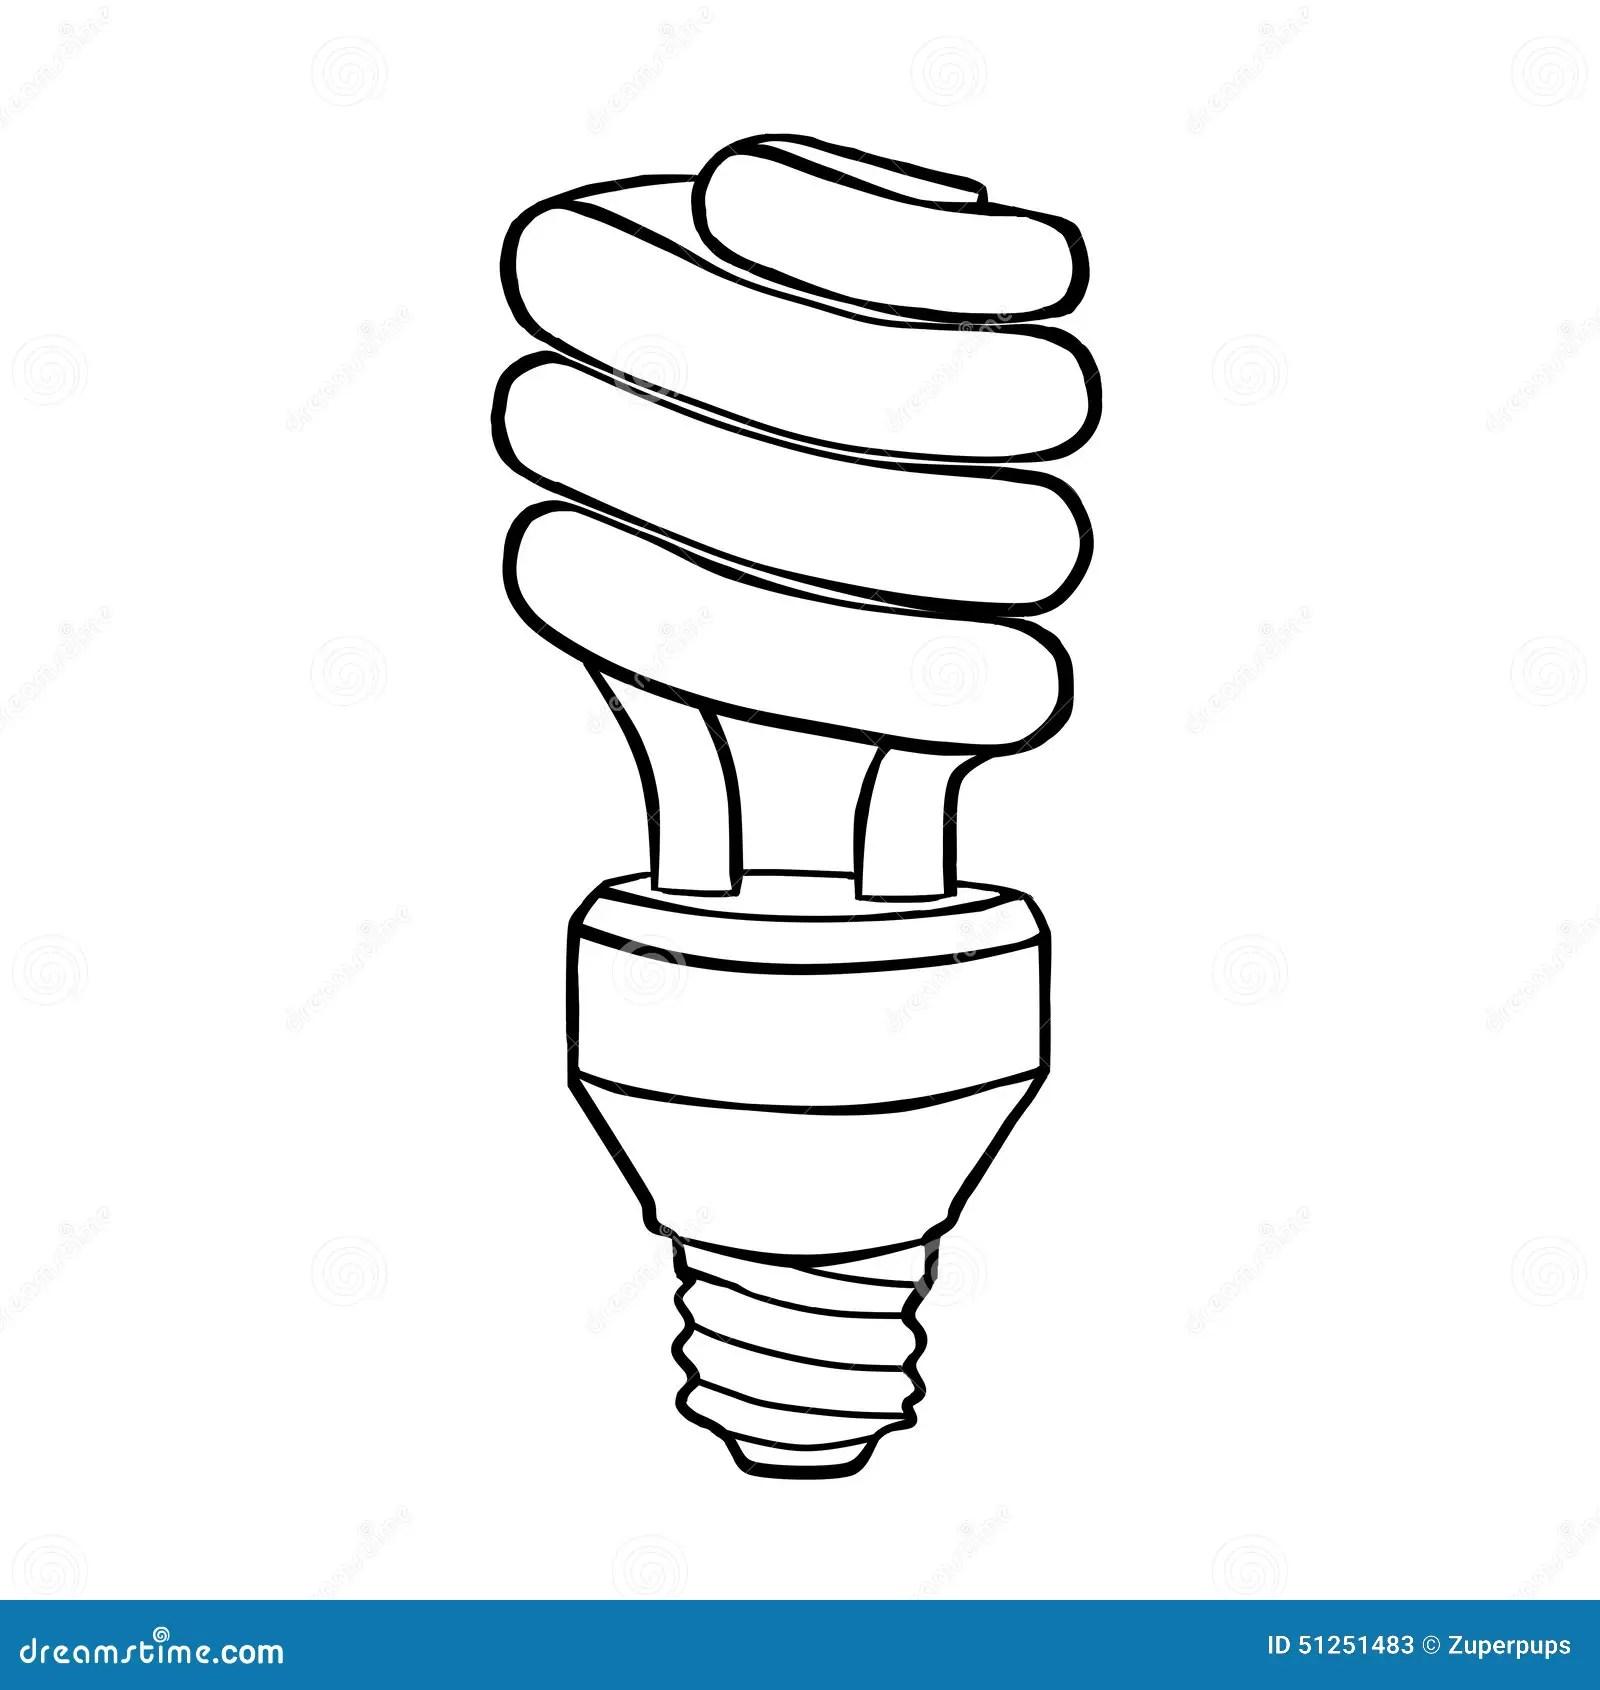 Spiral Energy Saving Electric Discharge Lamp Stock